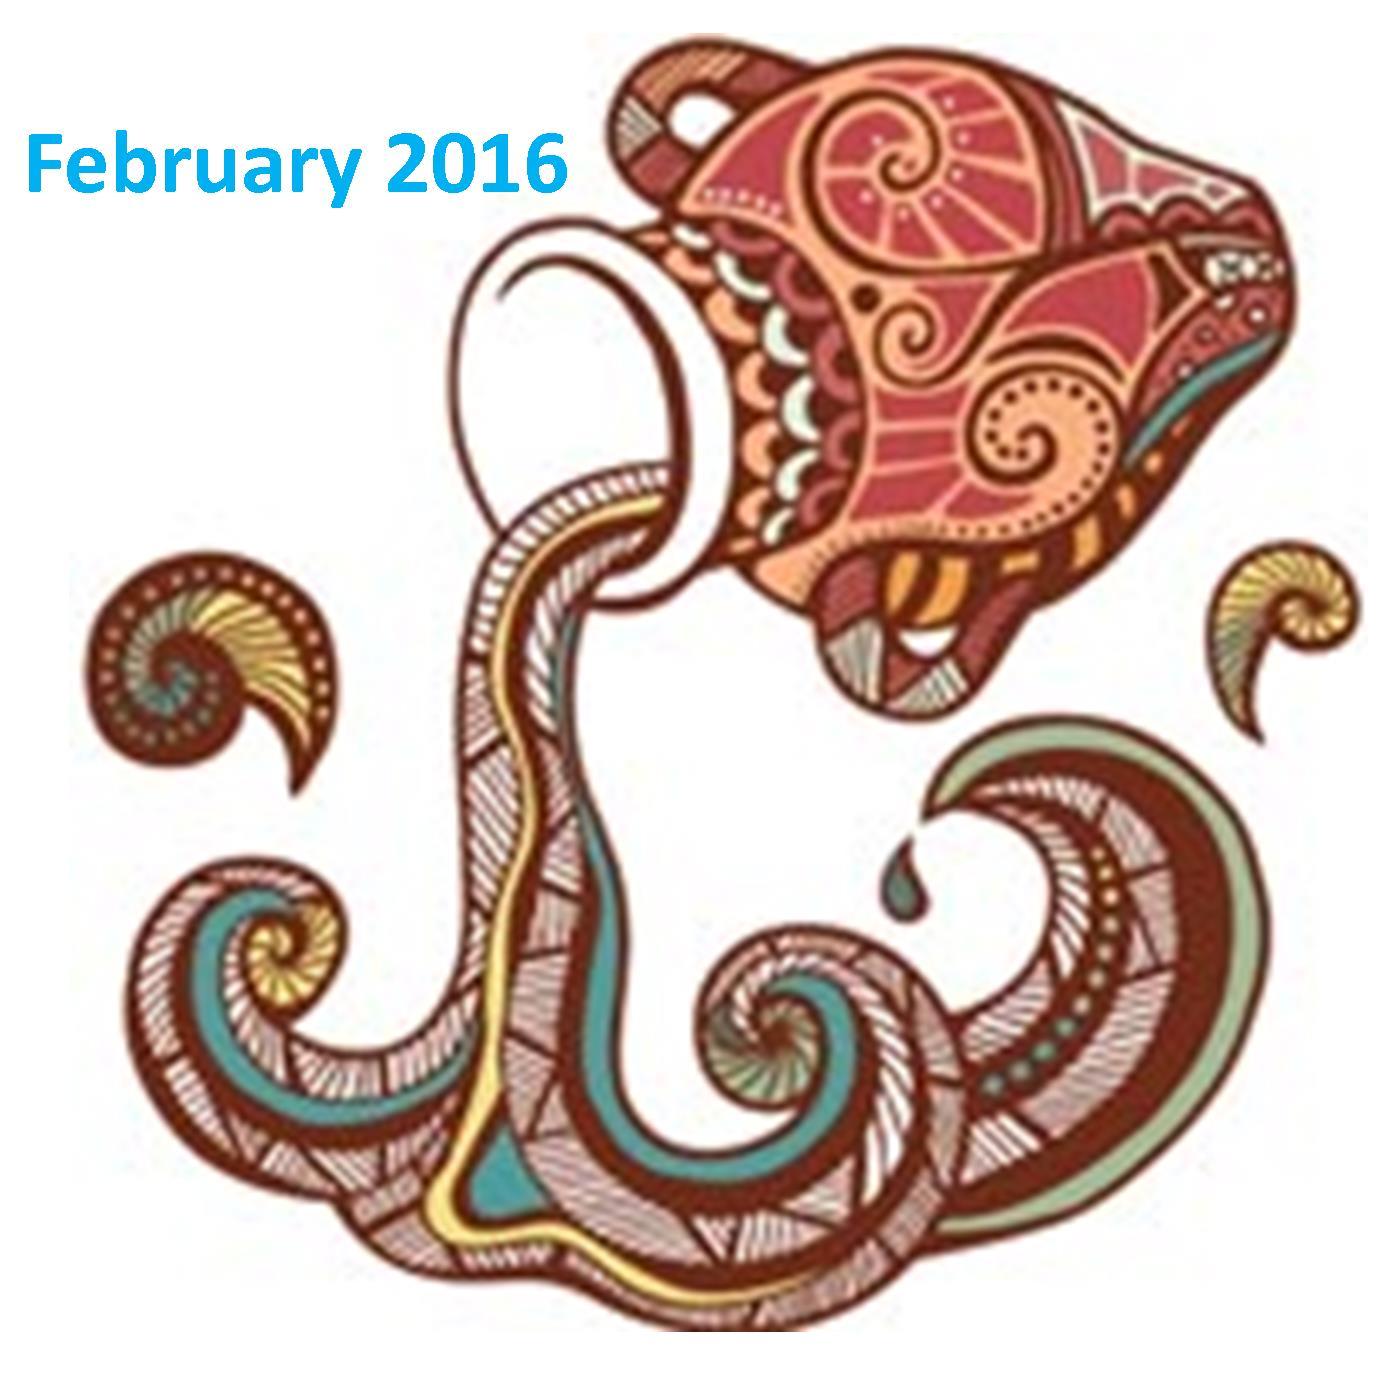 February 2016 Energetic Forecast